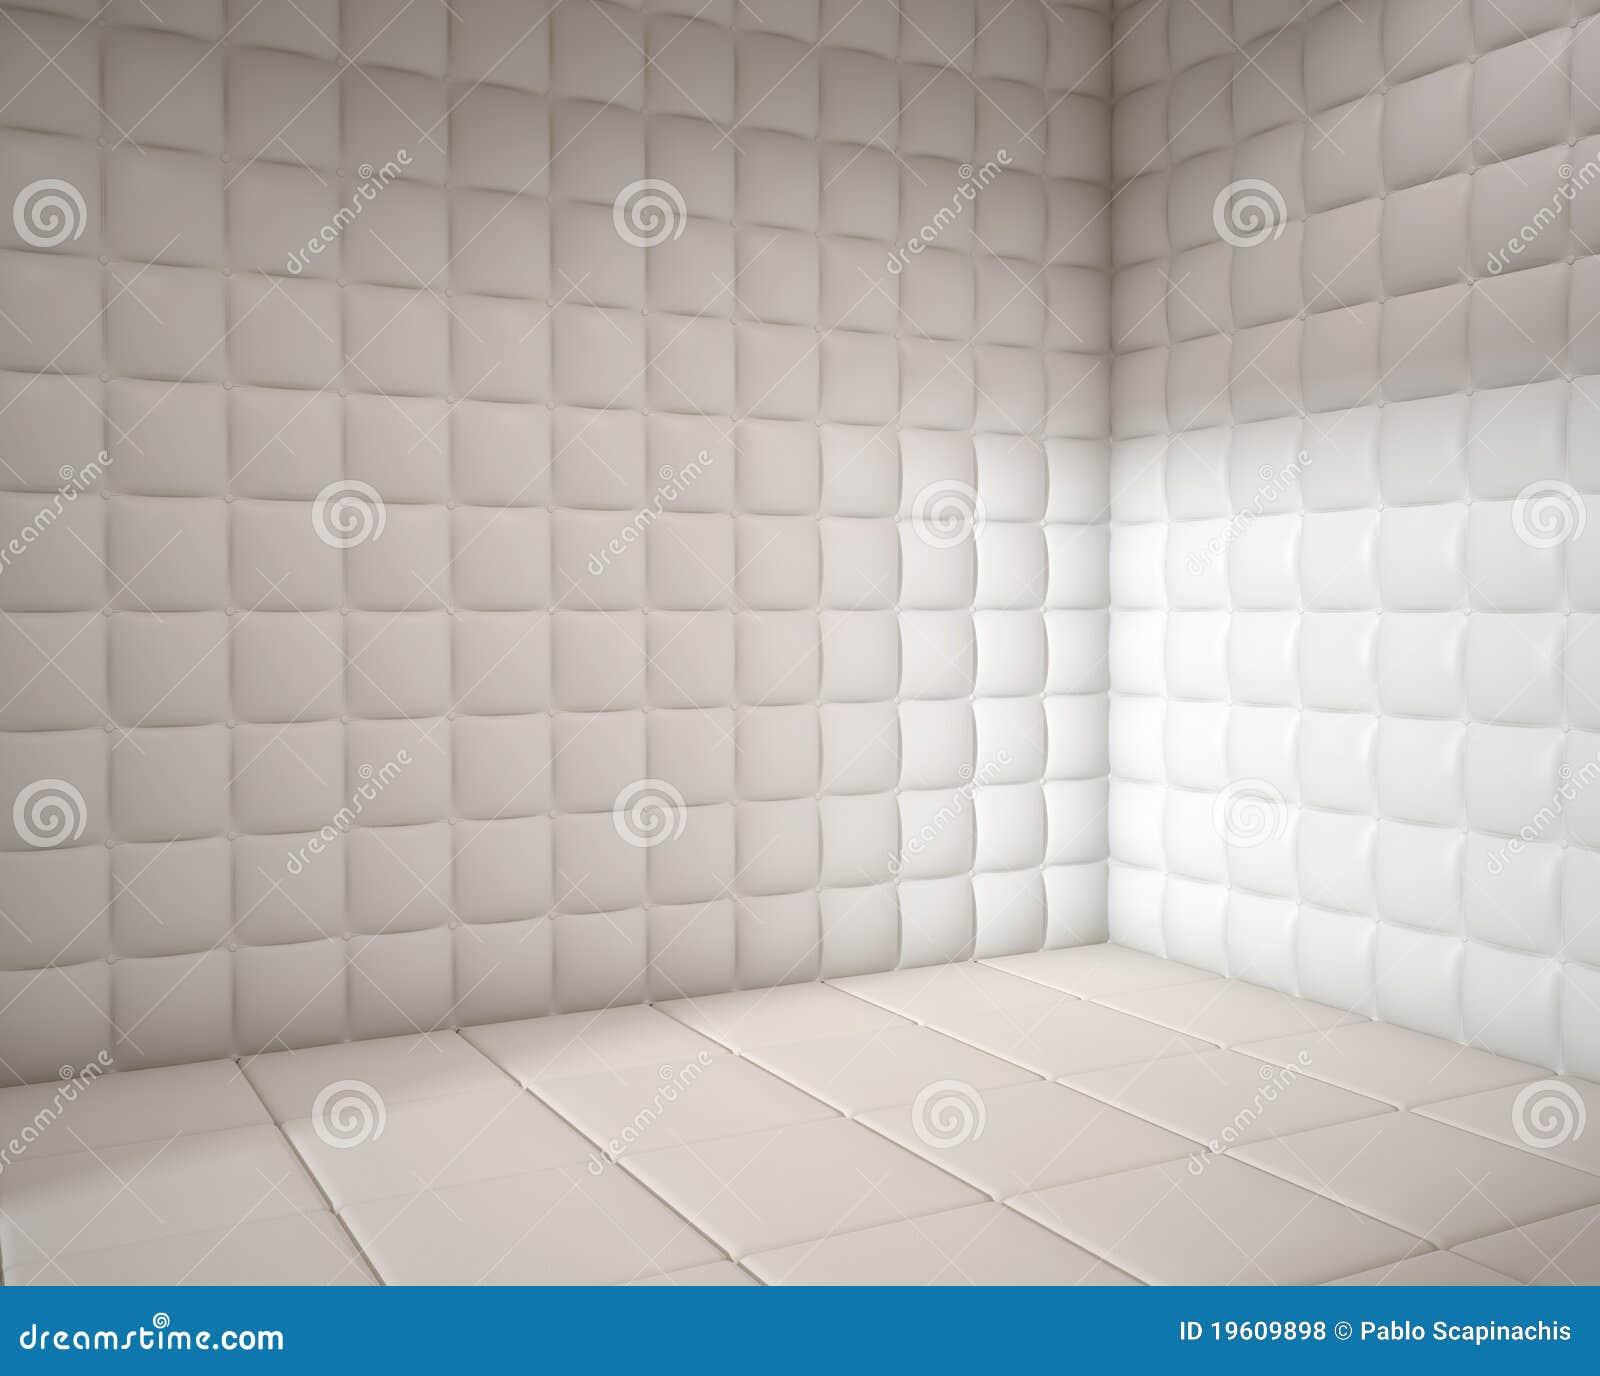 Empty White Padded Room Royalty Free Stock Photos - Image: 19609898